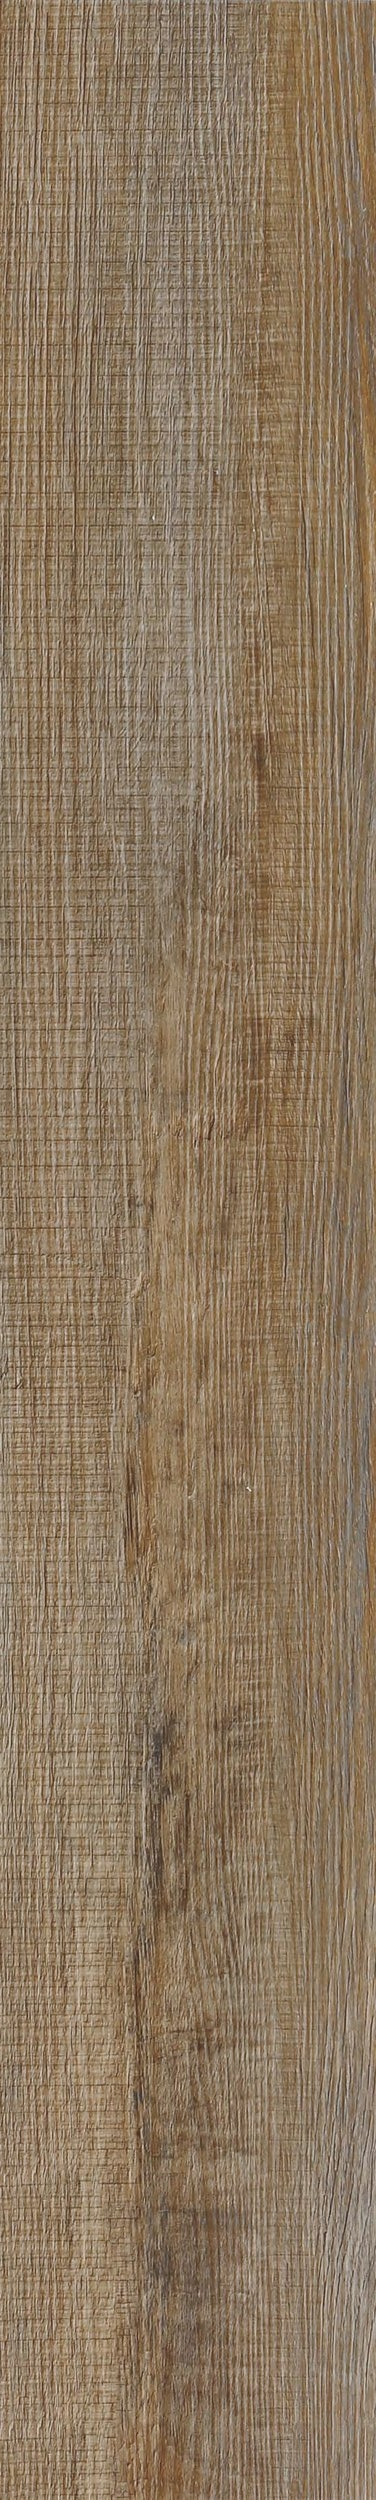 705 Acorn Rustic Oak